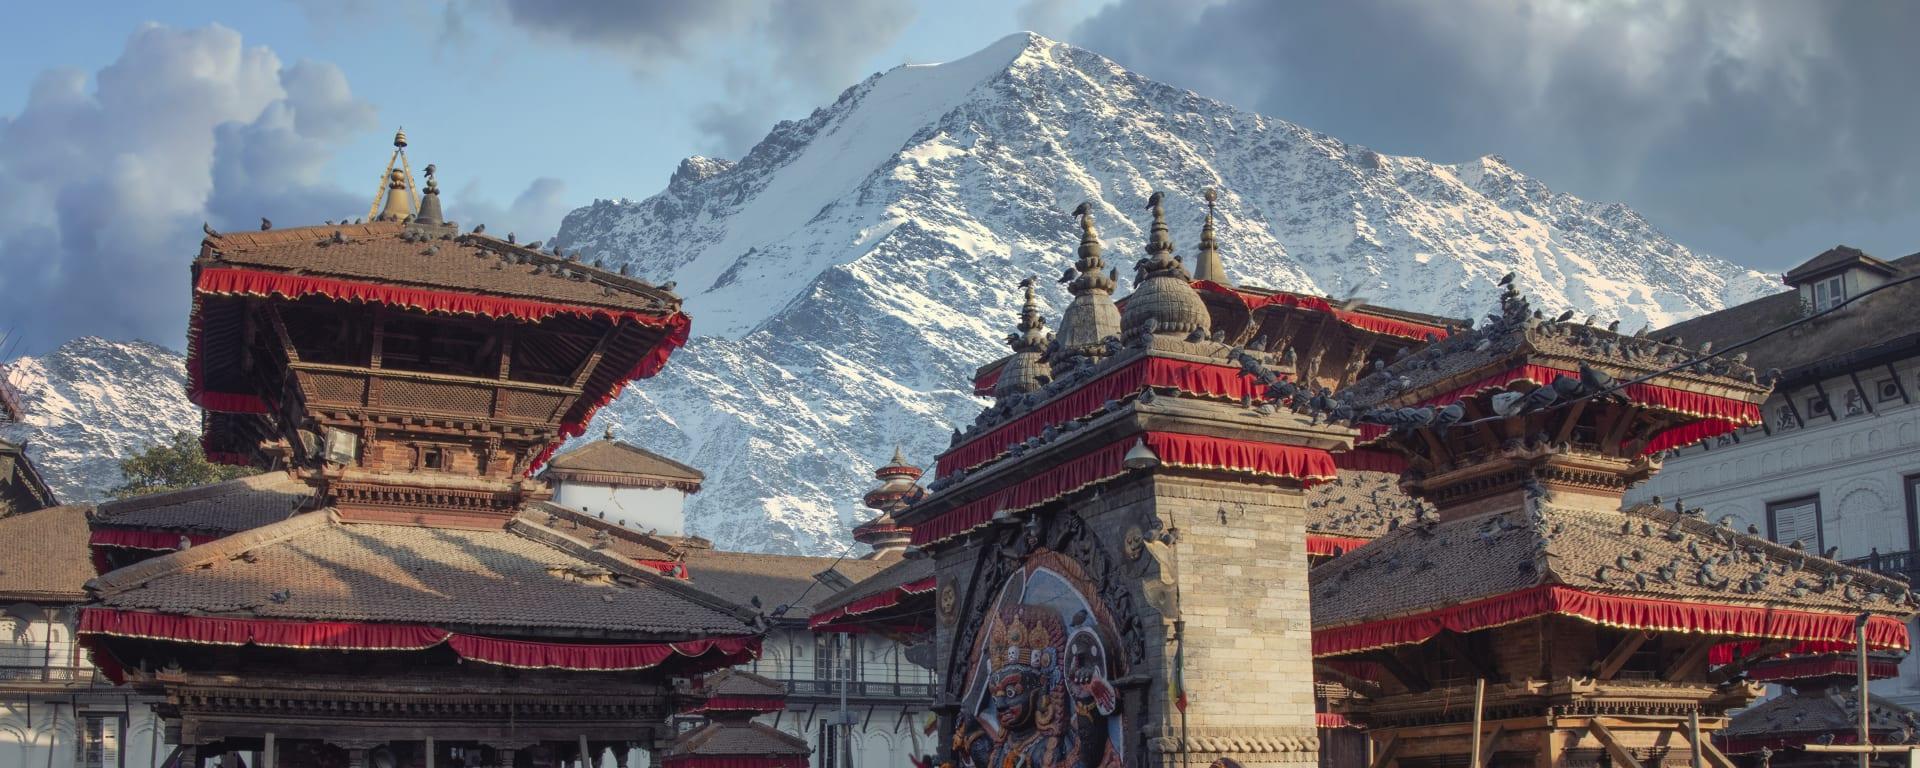 Nepal entdecken mit Tischler Reisen: Nepal Patan Kathmandu Tal